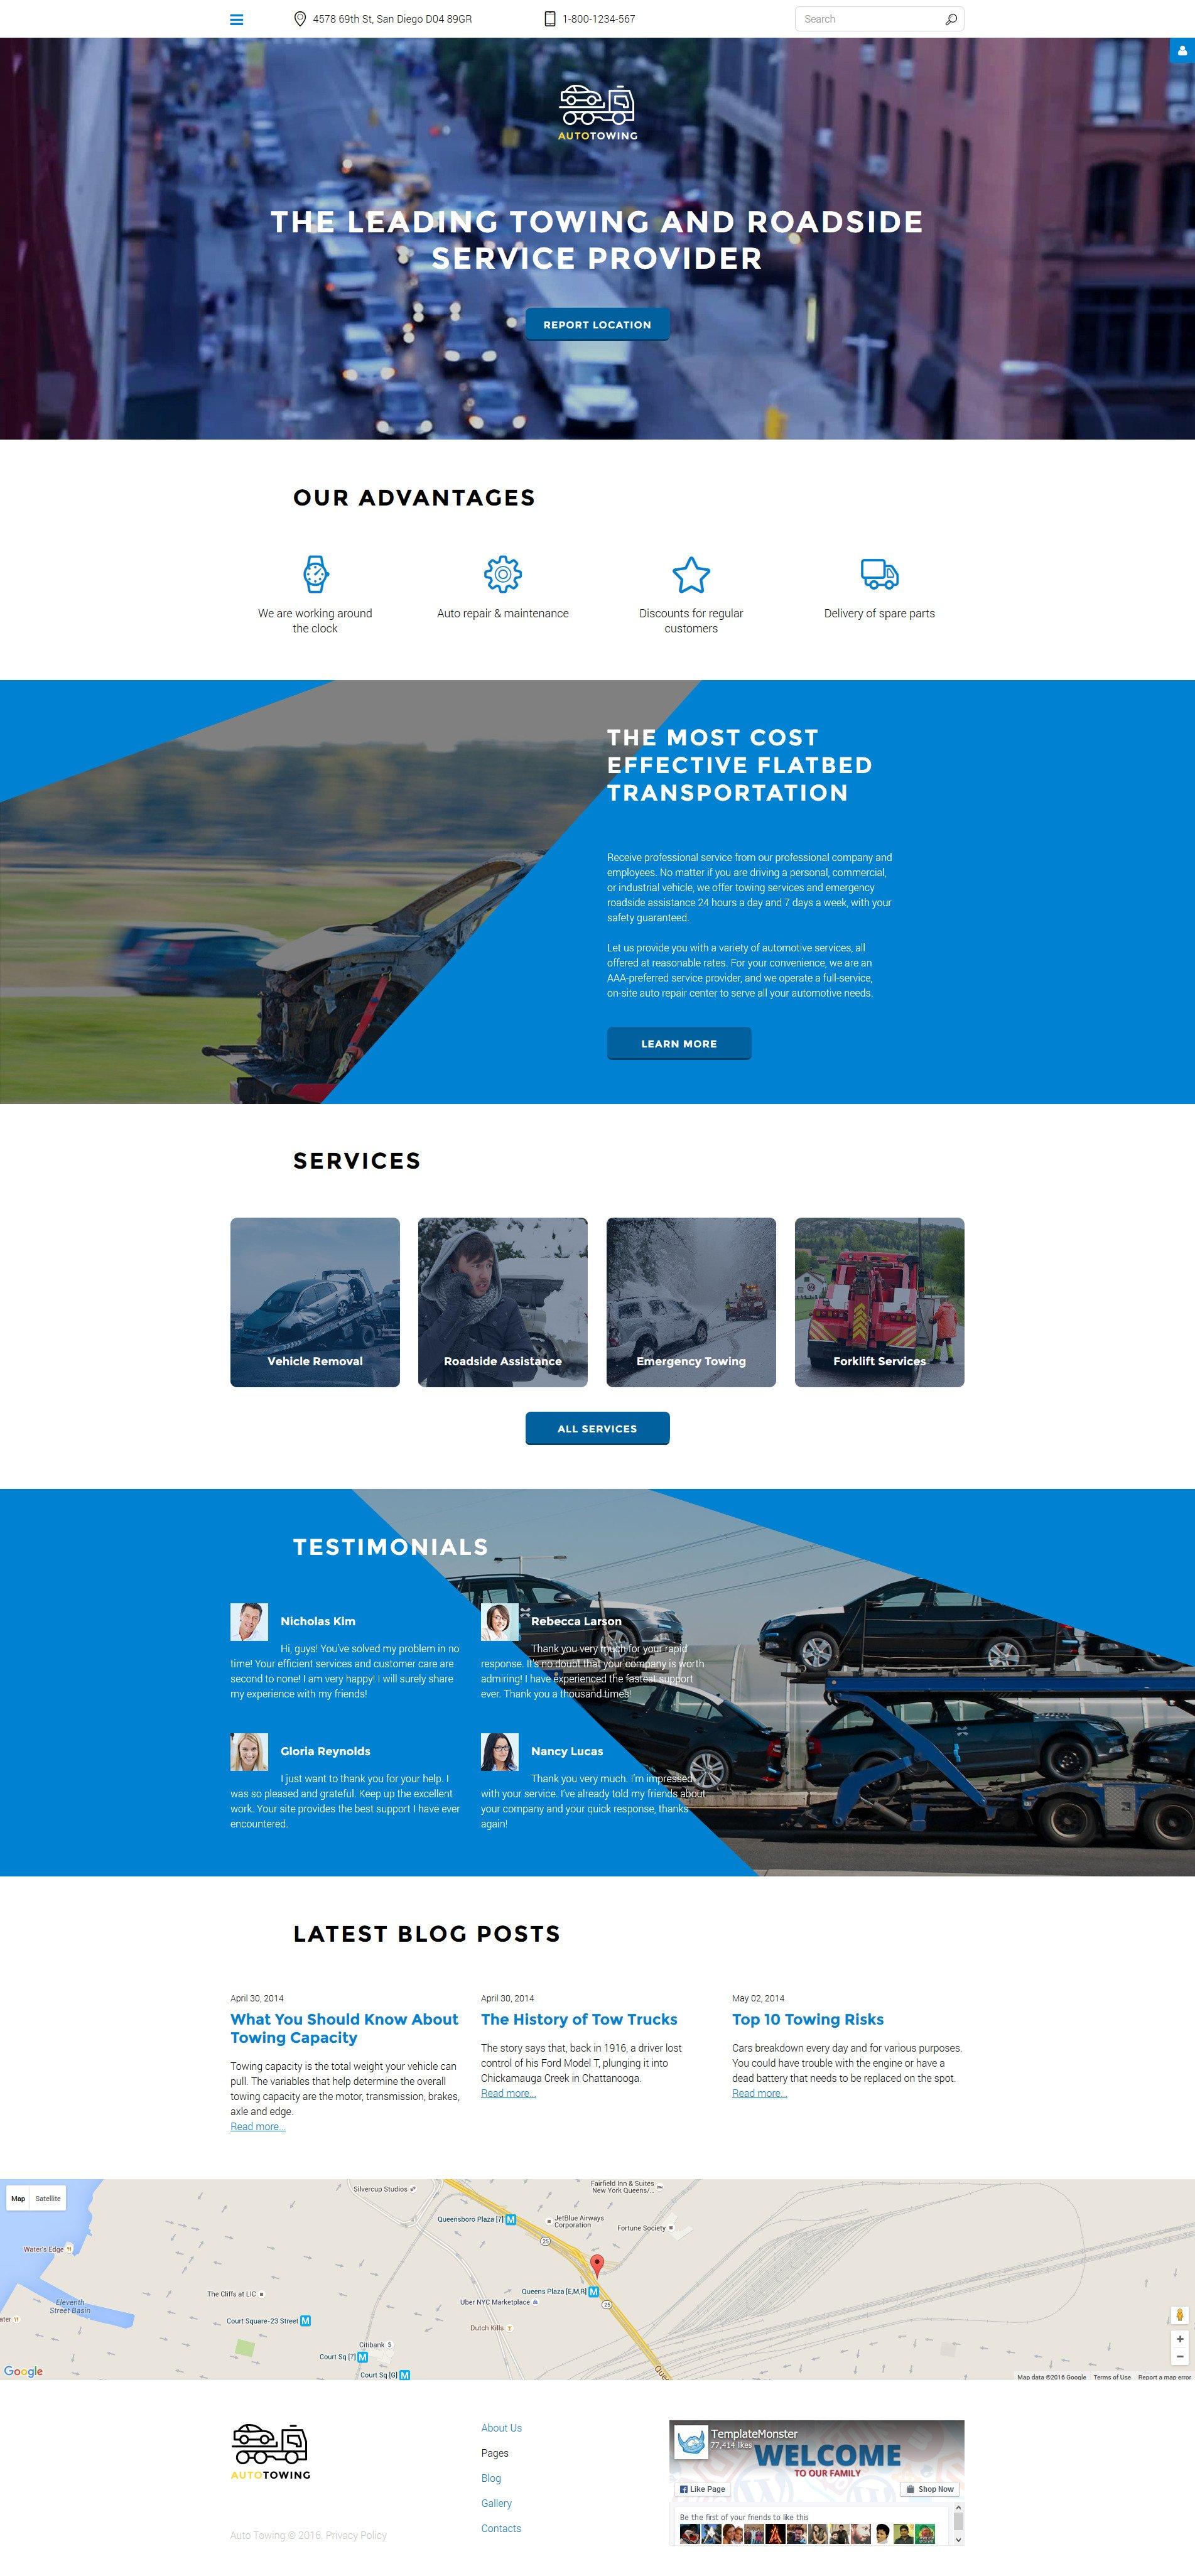 Thème Joomla adaptatif pour site de remorquage auto #58172